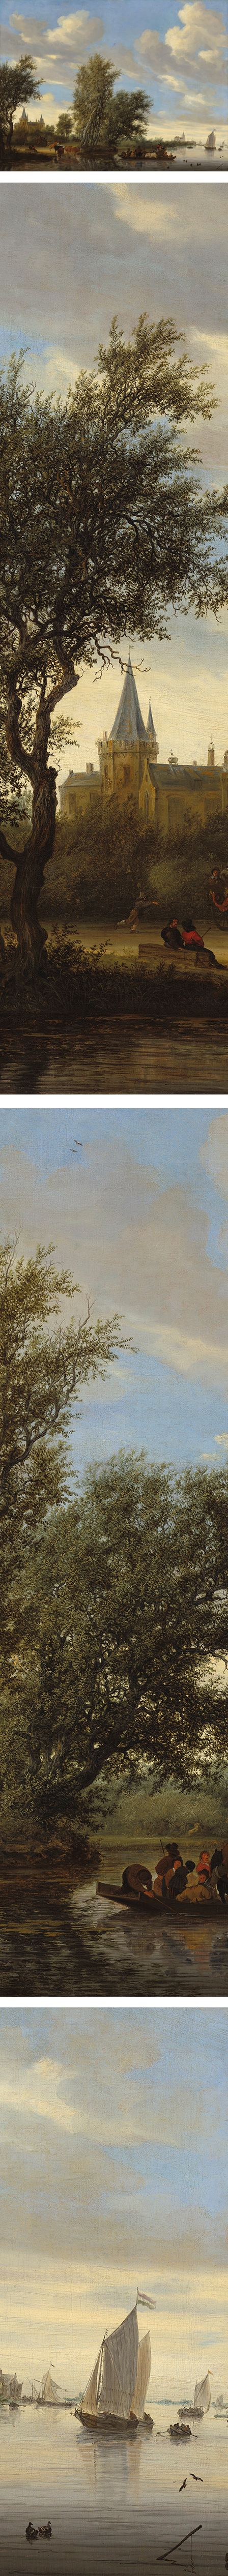 River Landscape with Ferry, Salomon van Ruysdael